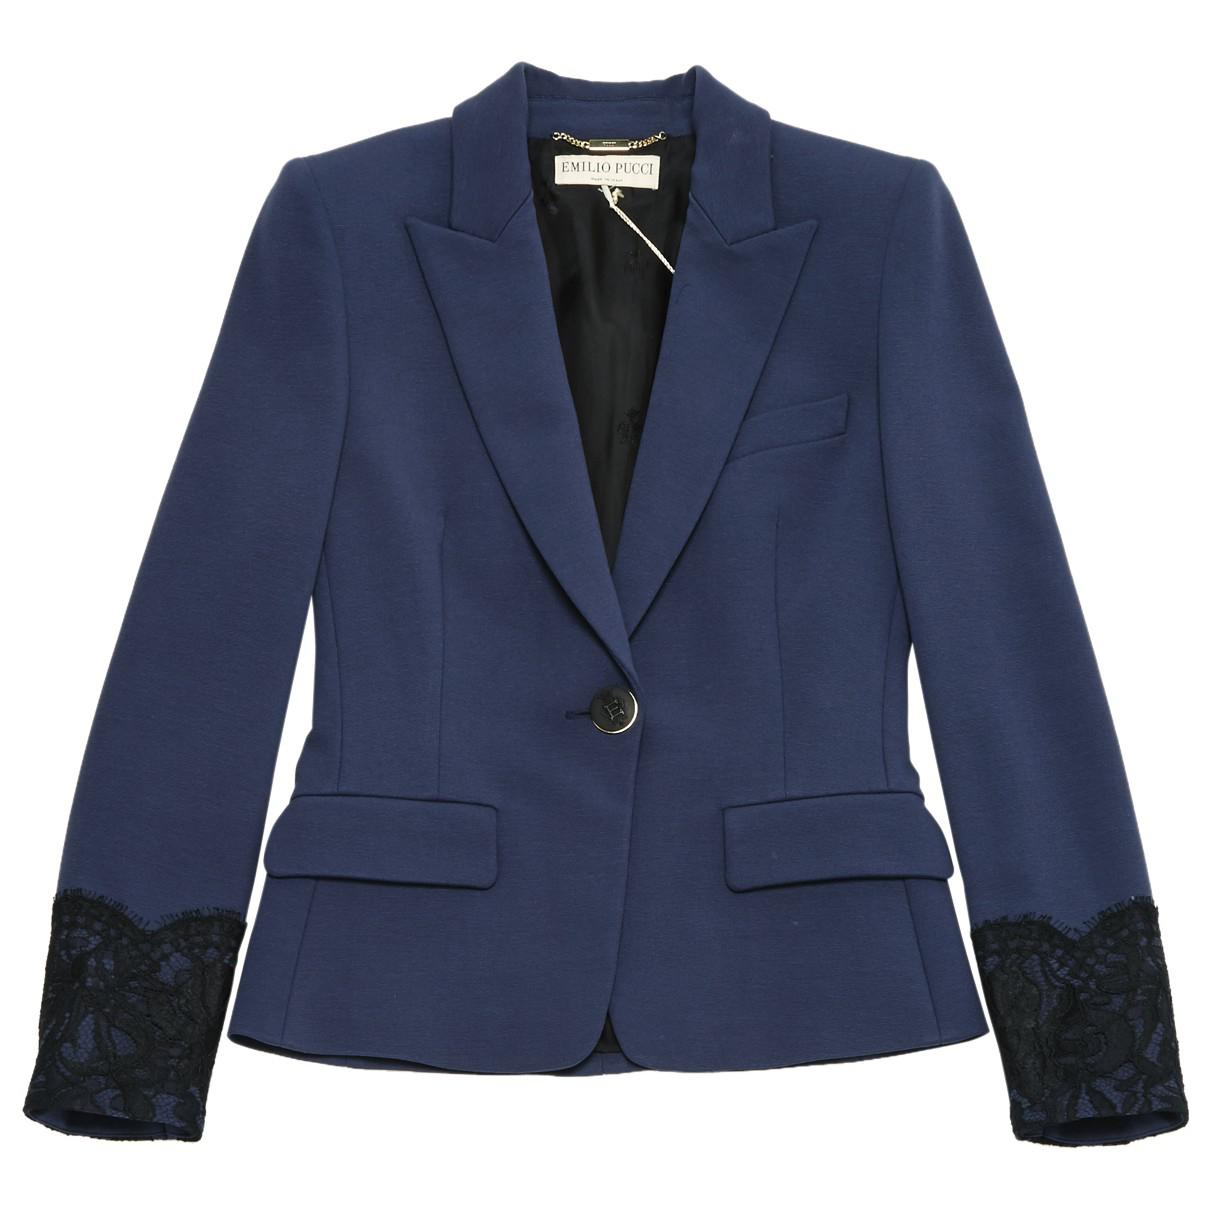 e2097a5c6b94 Emilio Pucci - Blue Green Viscose Jacket - Lyst. View fullscreen